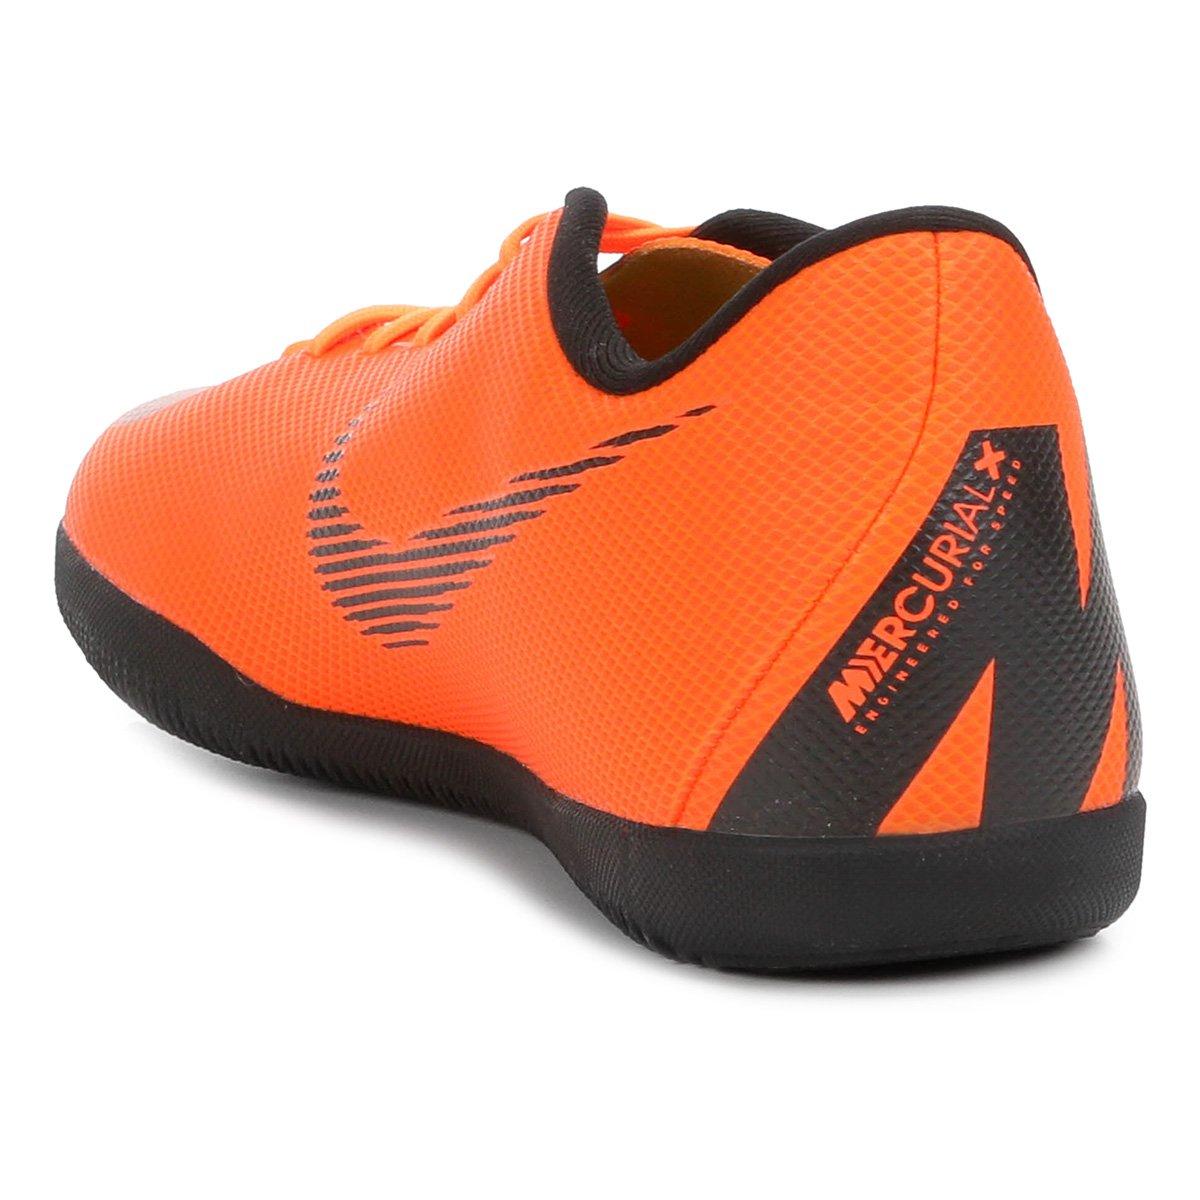 Chuteira Futsal Nike Mercurial Vapor 12 Club - Laranja e Preto ... ac2d6dbe1eae4